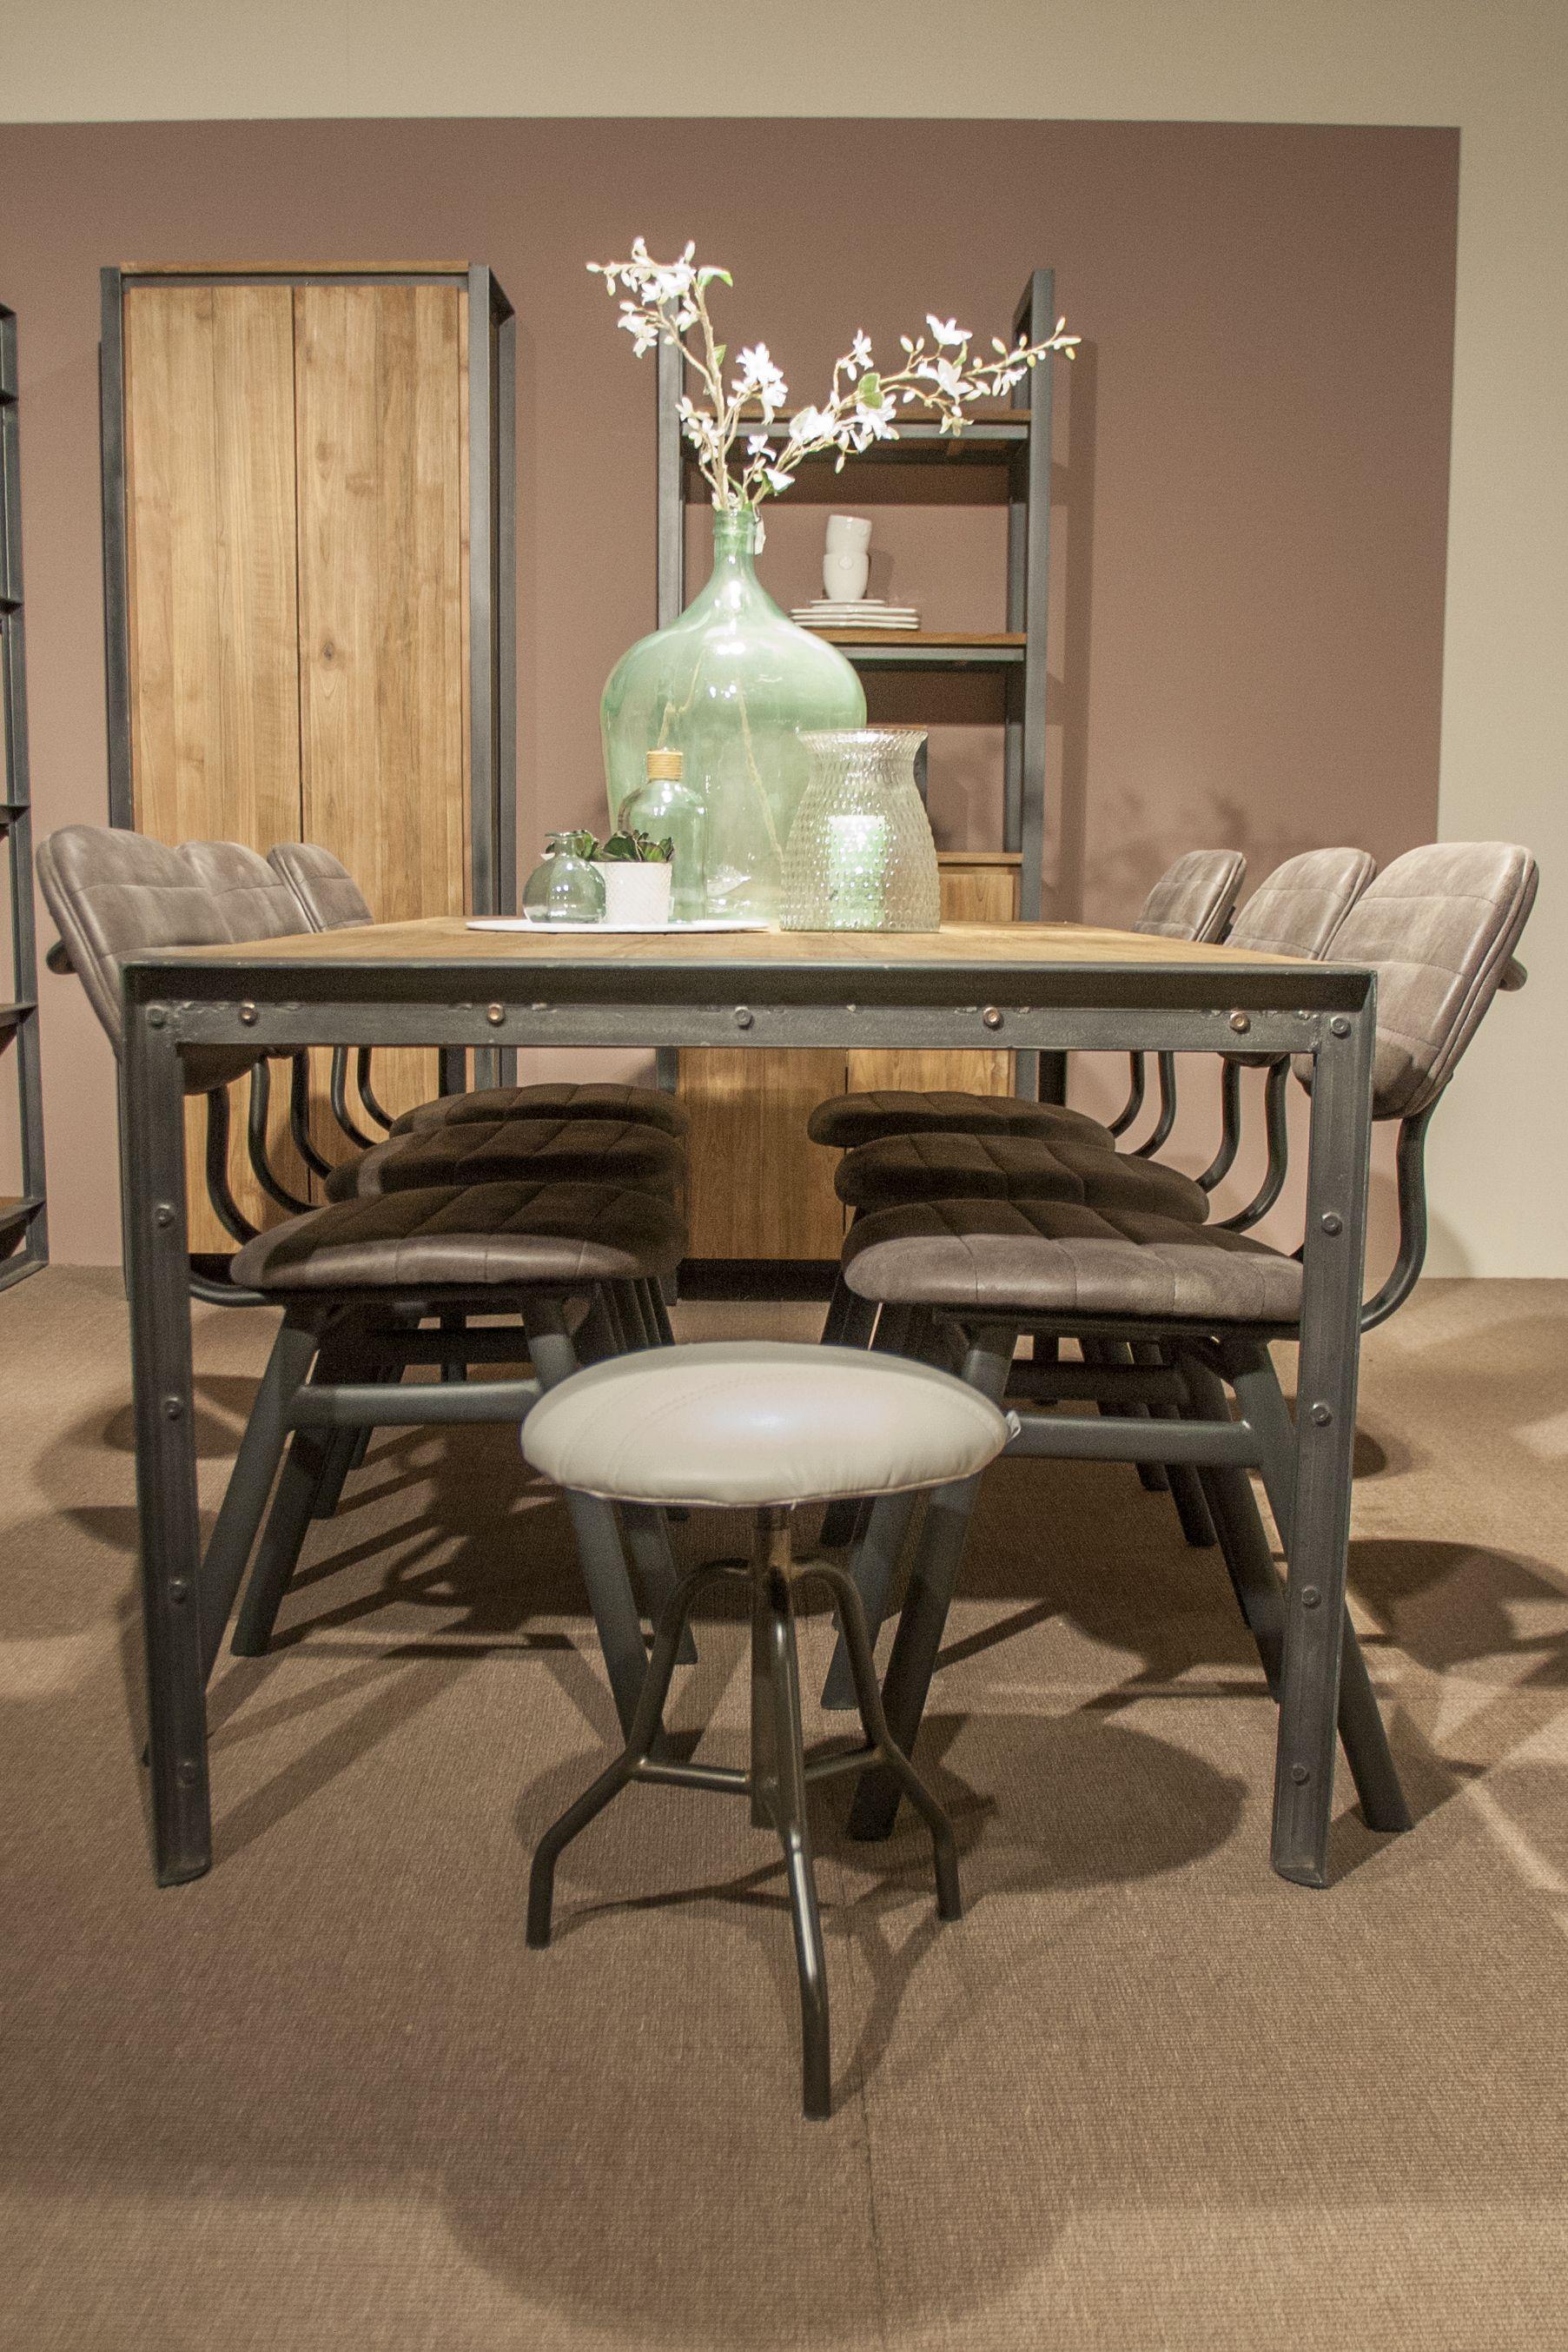 D bodhi vintage meubelen stoel exclusief duurzaam for Woonboulevard wolvega